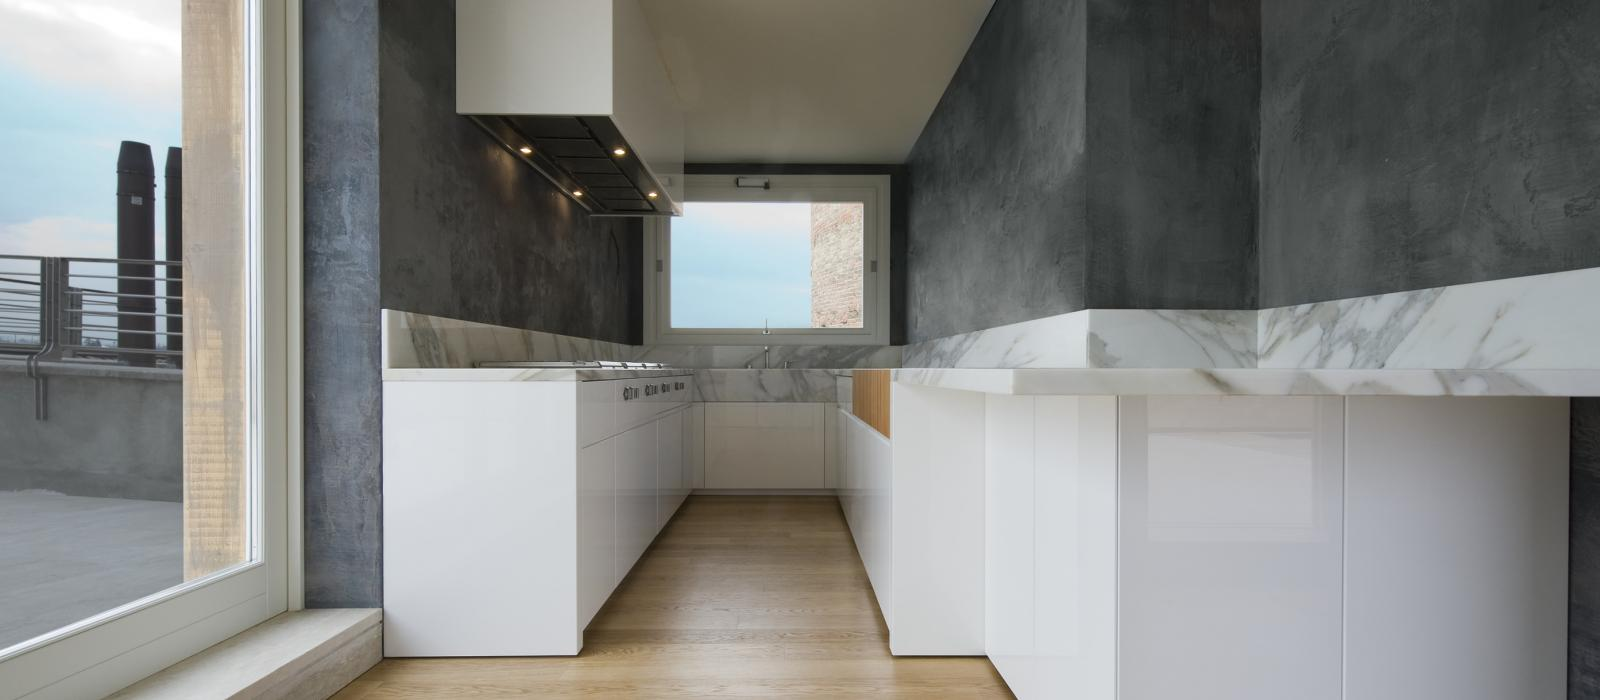 Welcome To Matteo Gennari Kitchens